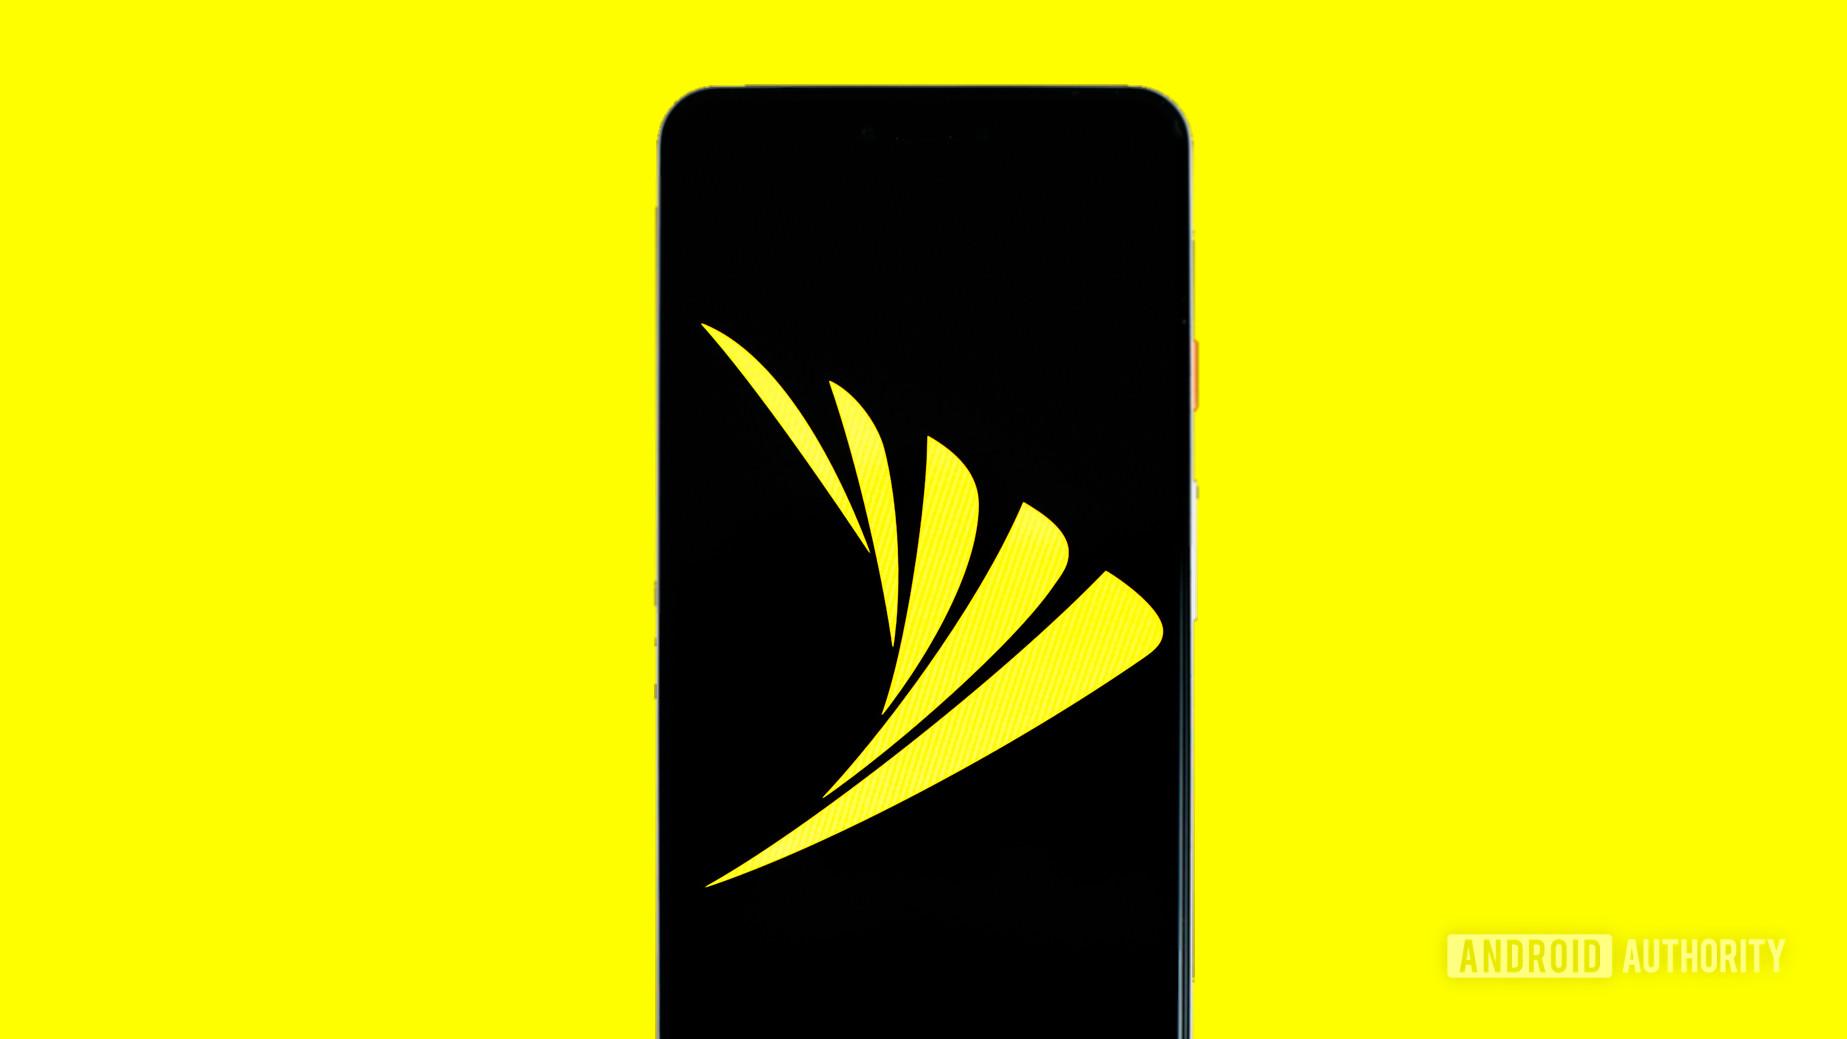 Sprint logo on phone stock photo